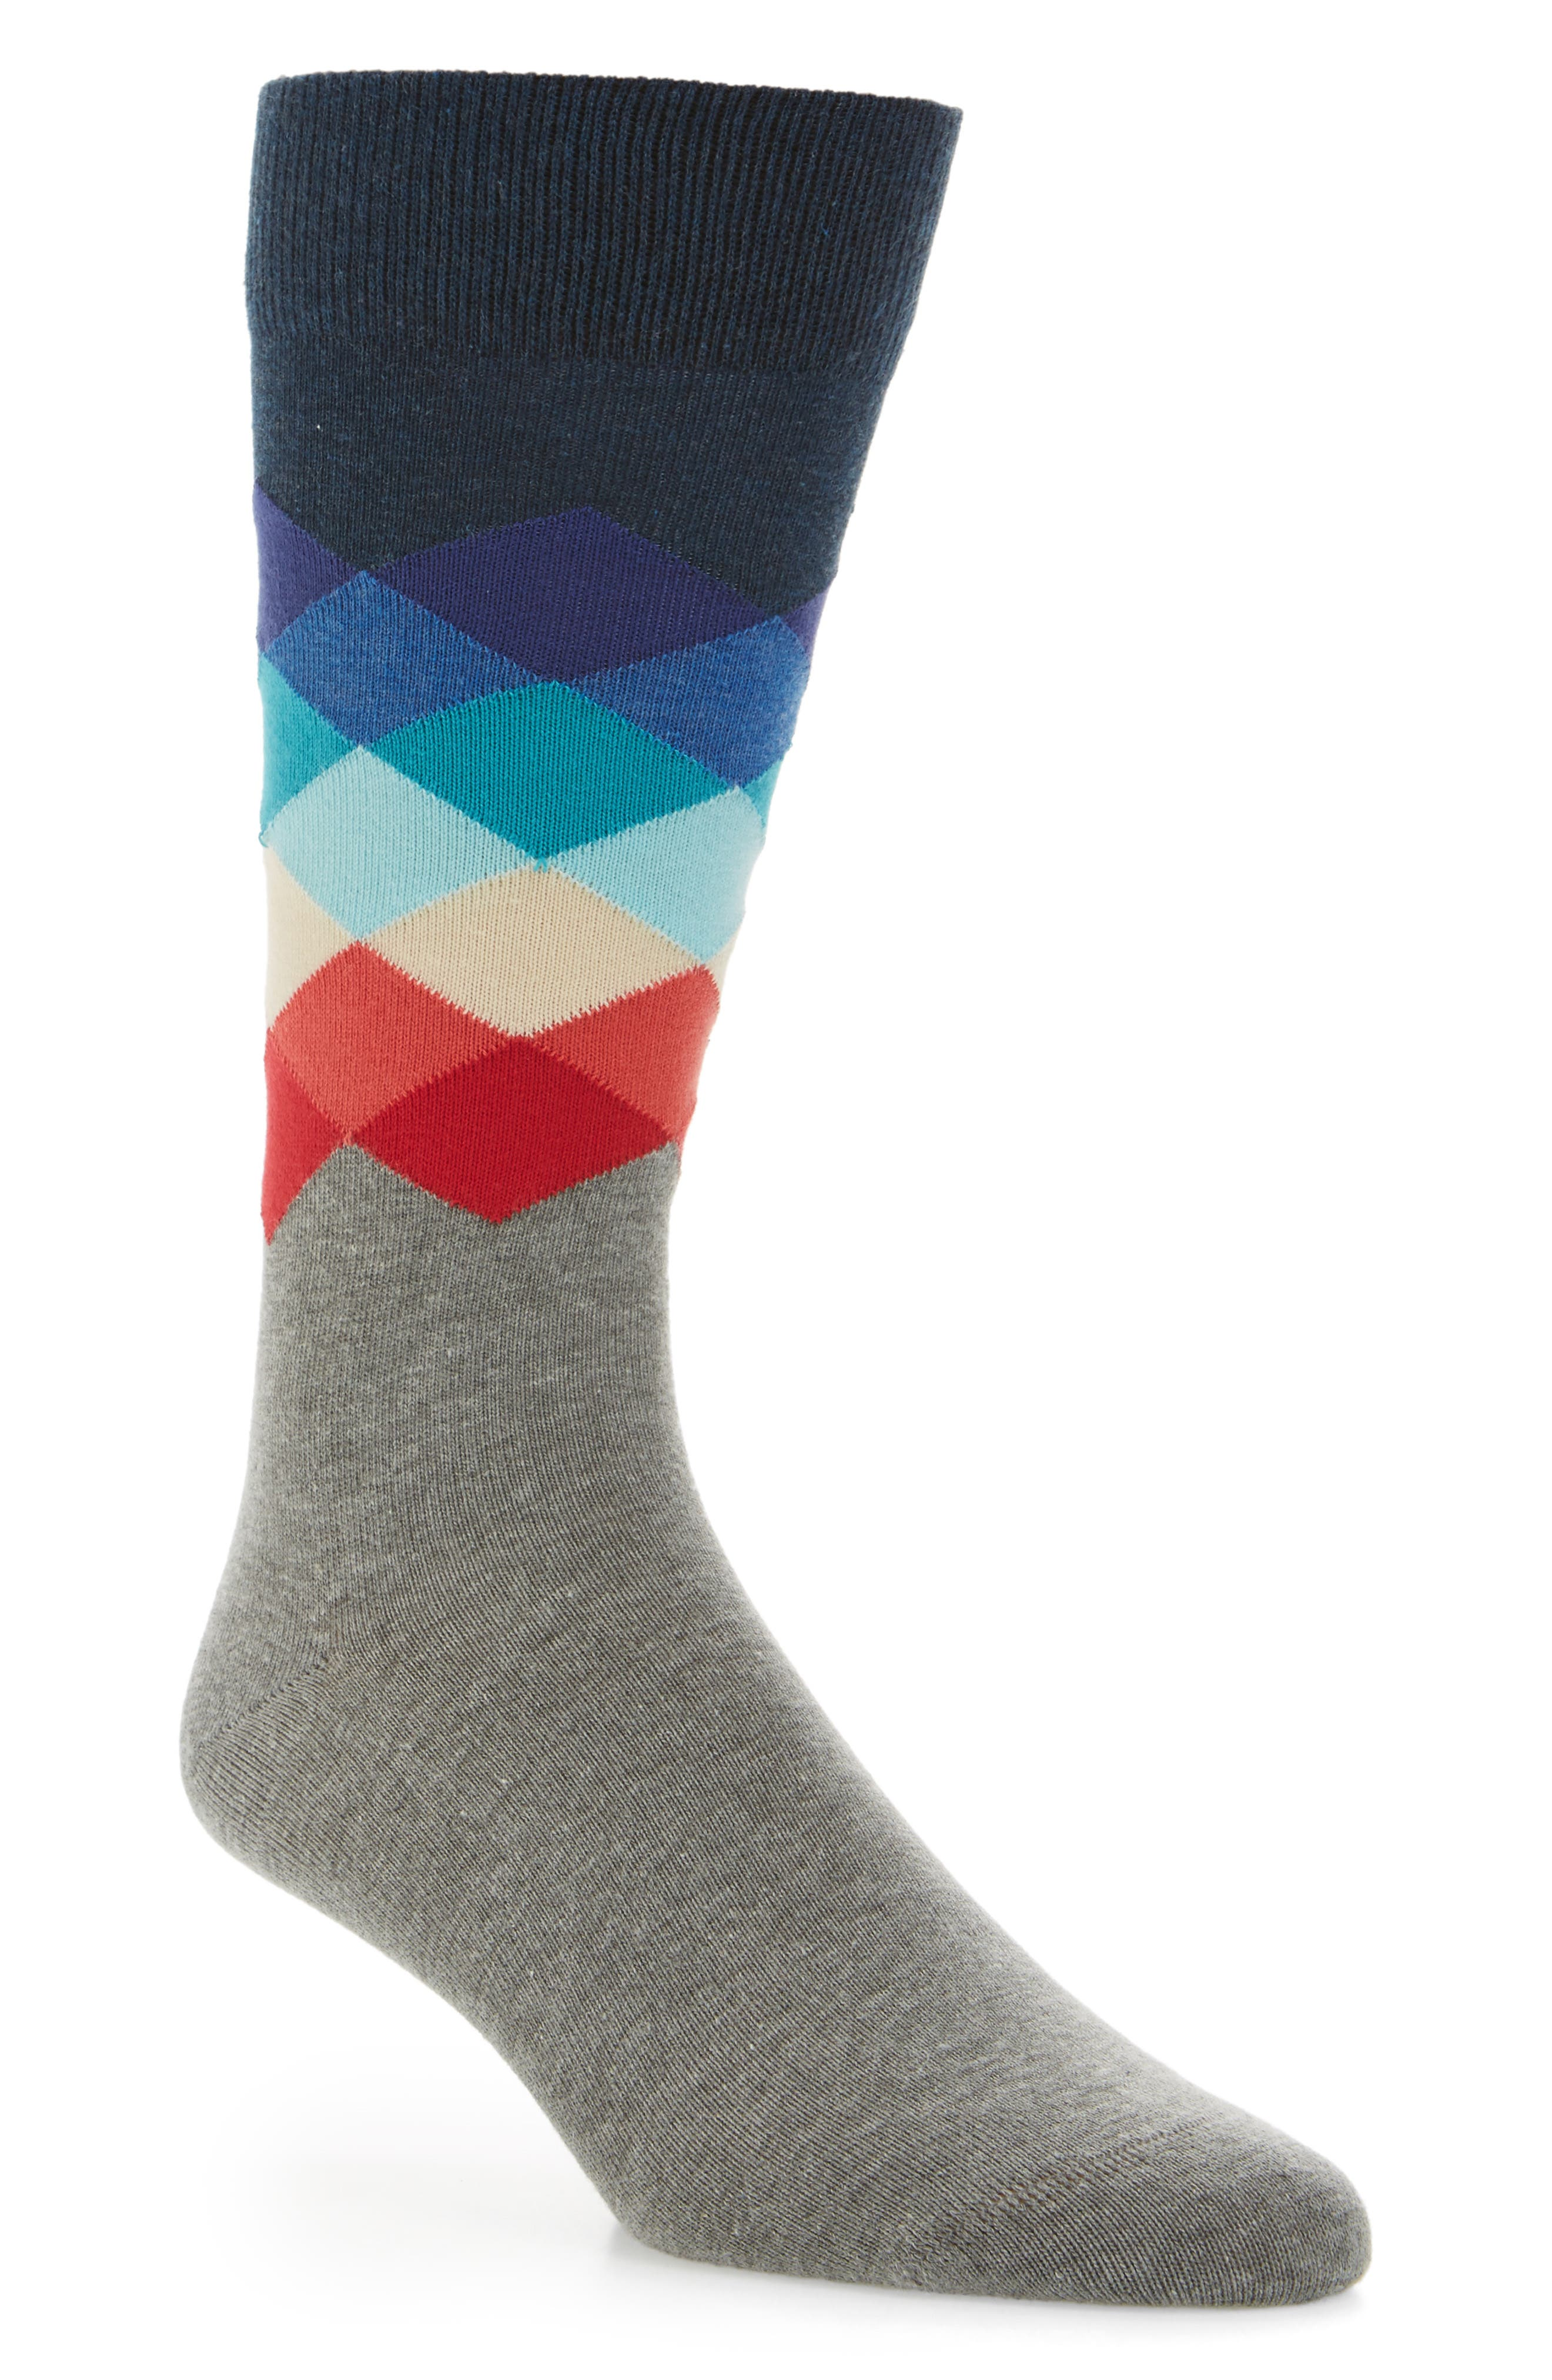 Faded Diamond Socks,                         Main,                         color, Navy Multi